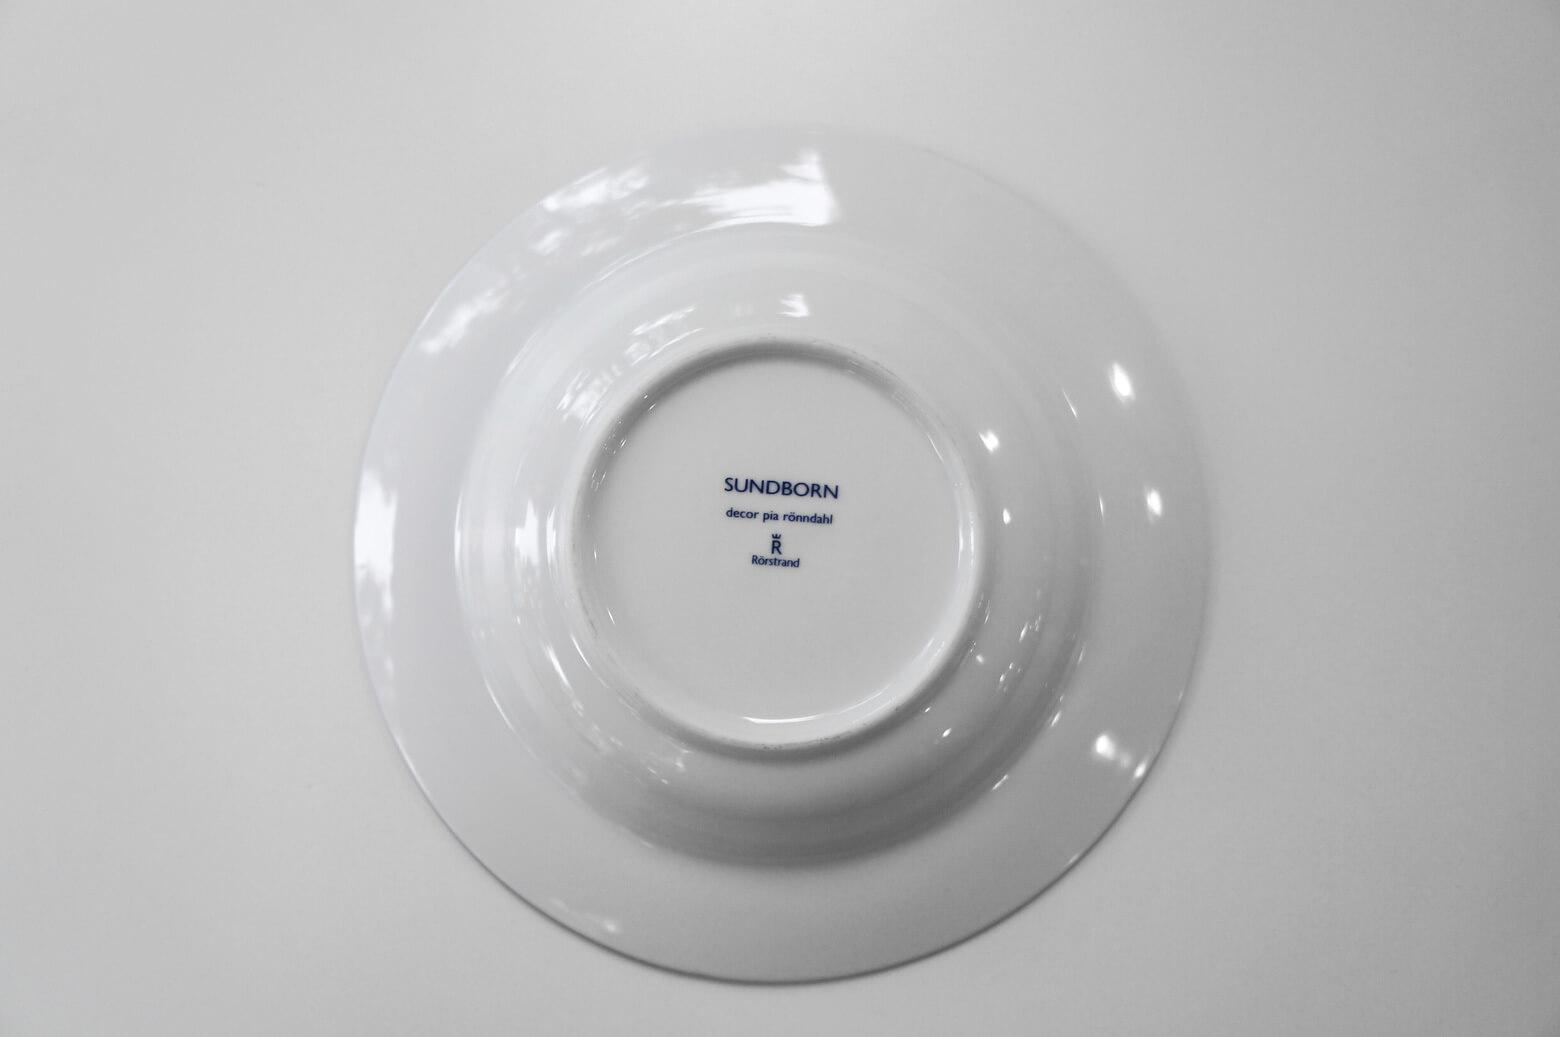 Rorstrand Sundborn Deep Plate 24cm/ロールストランド スンドボーン ディーププレート 1